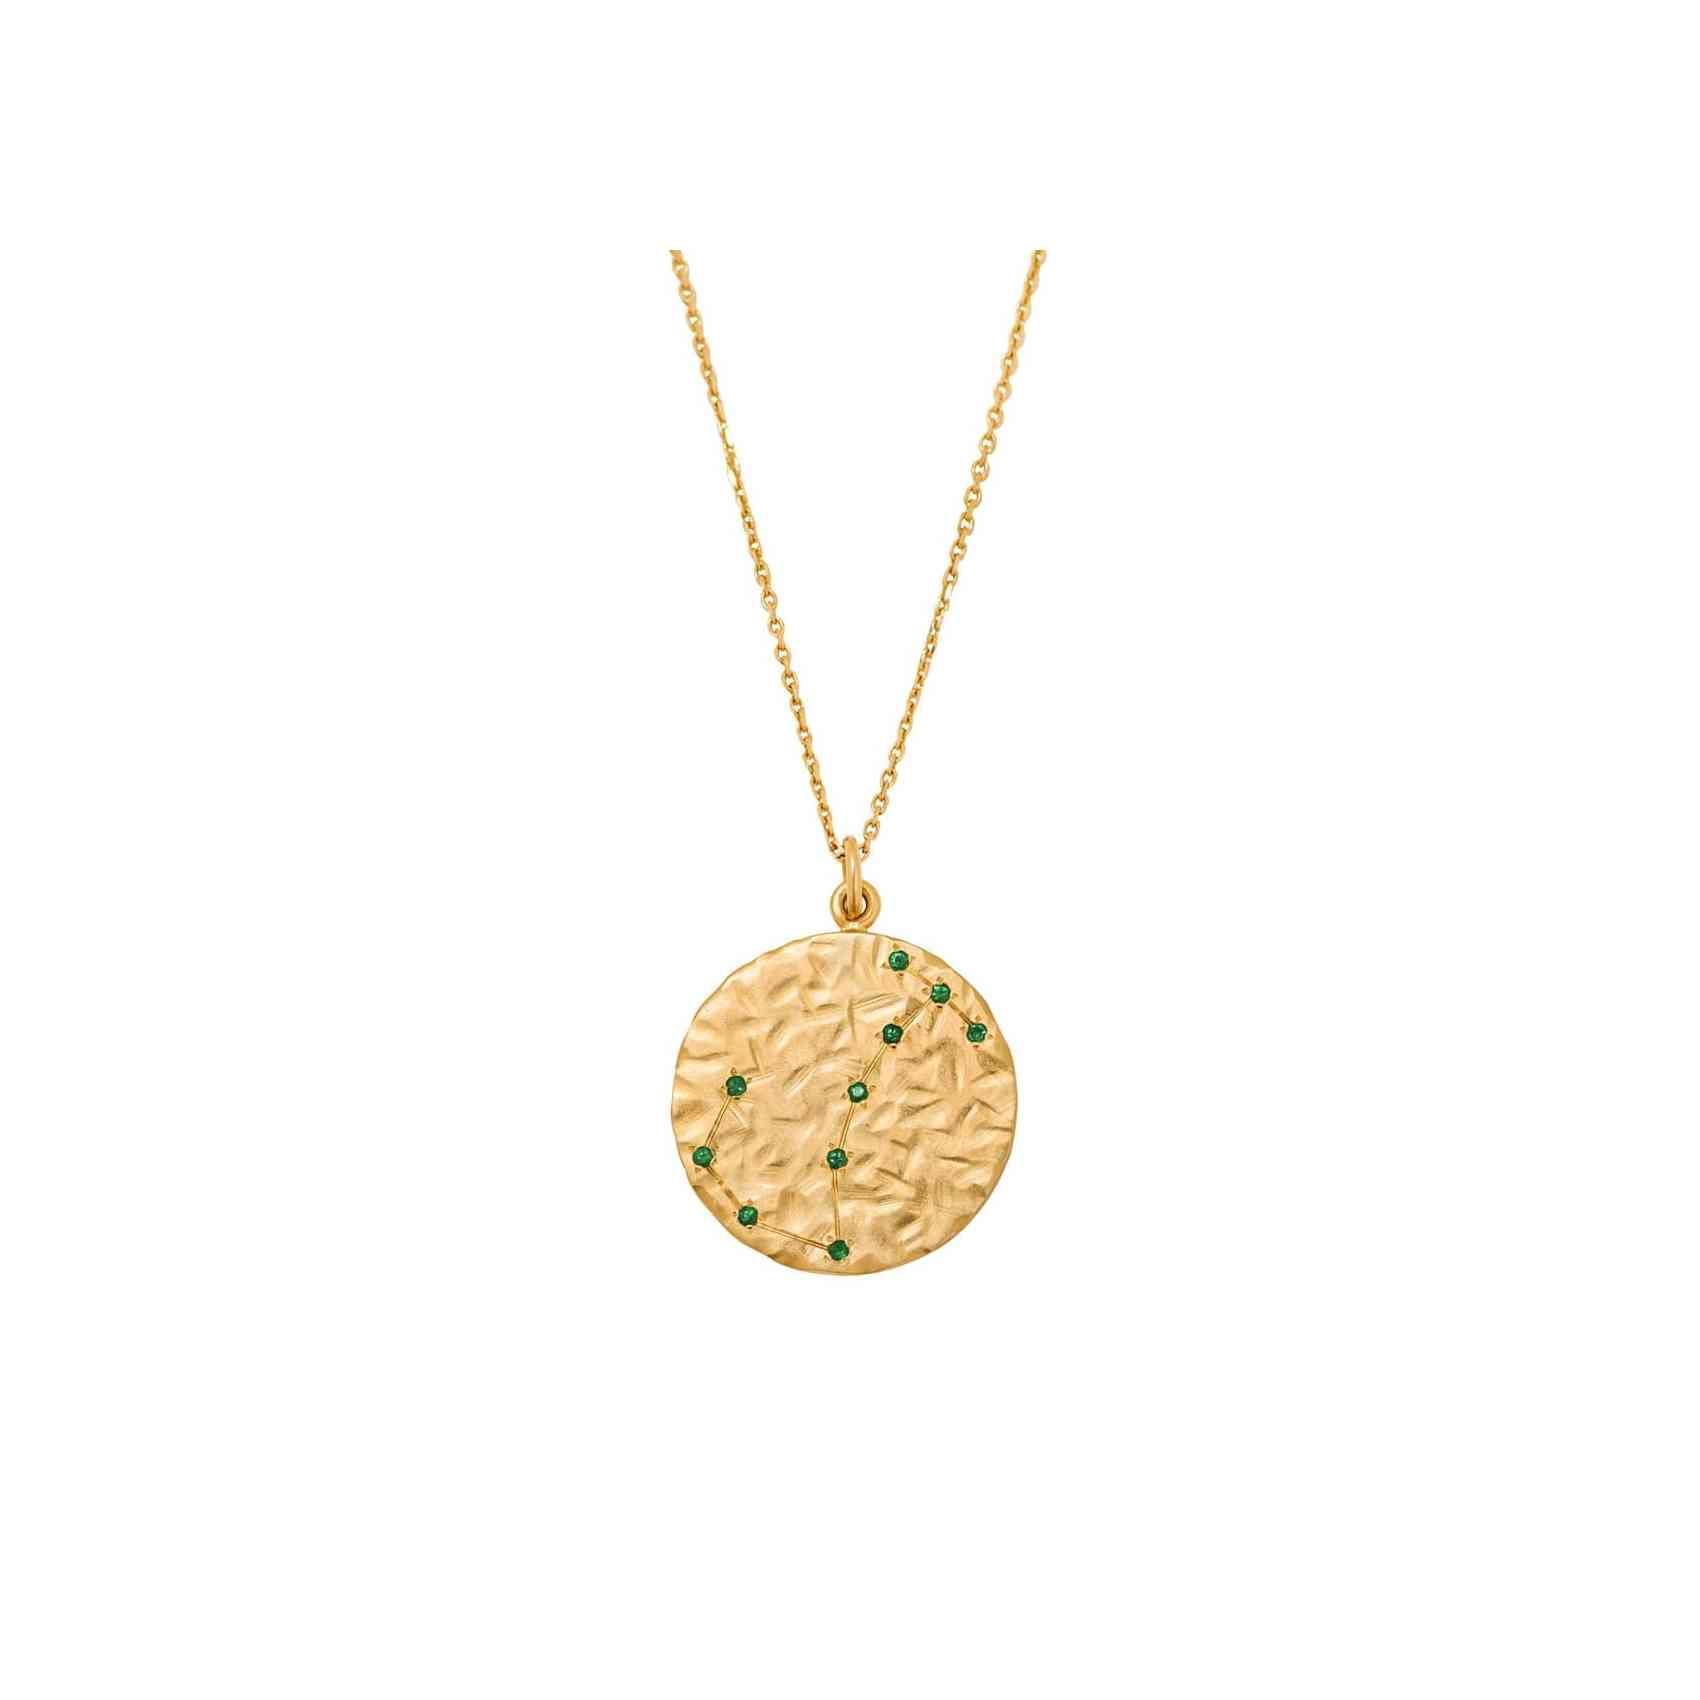 Colier Constelatie din Aur Galben 14K cu Smaralde